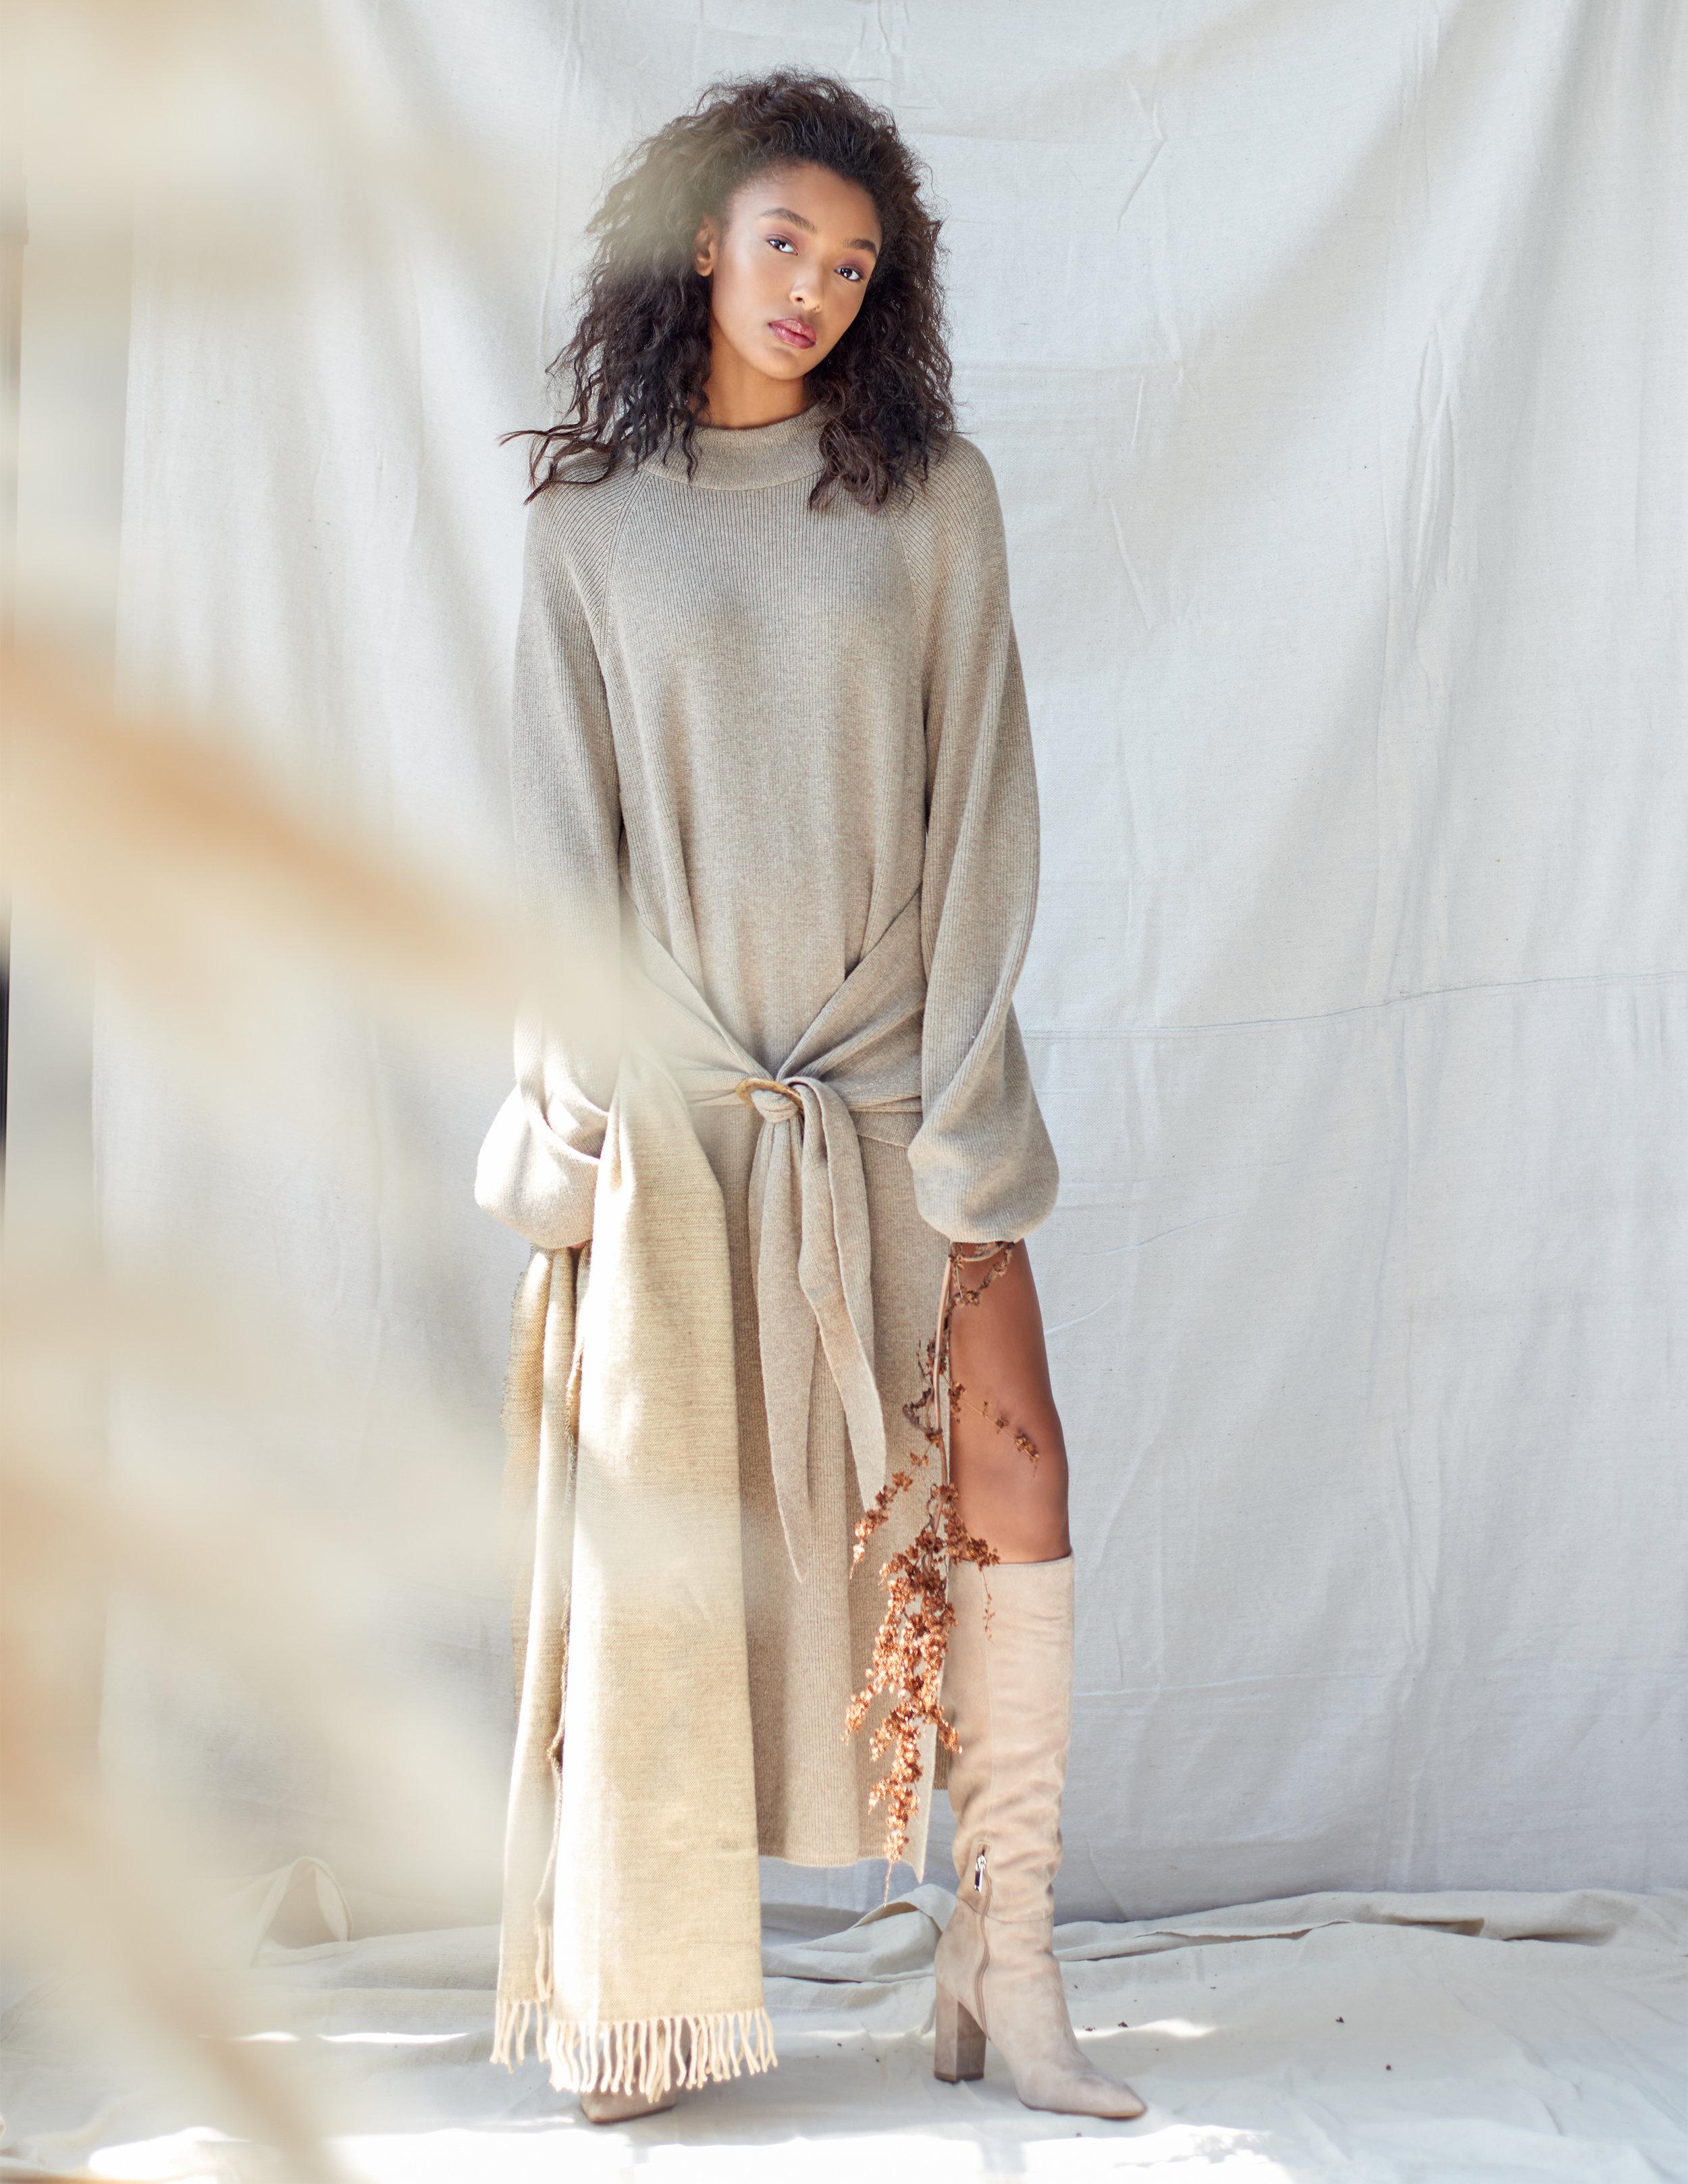 Nanushka sweaterdress  Marc Fisher boots